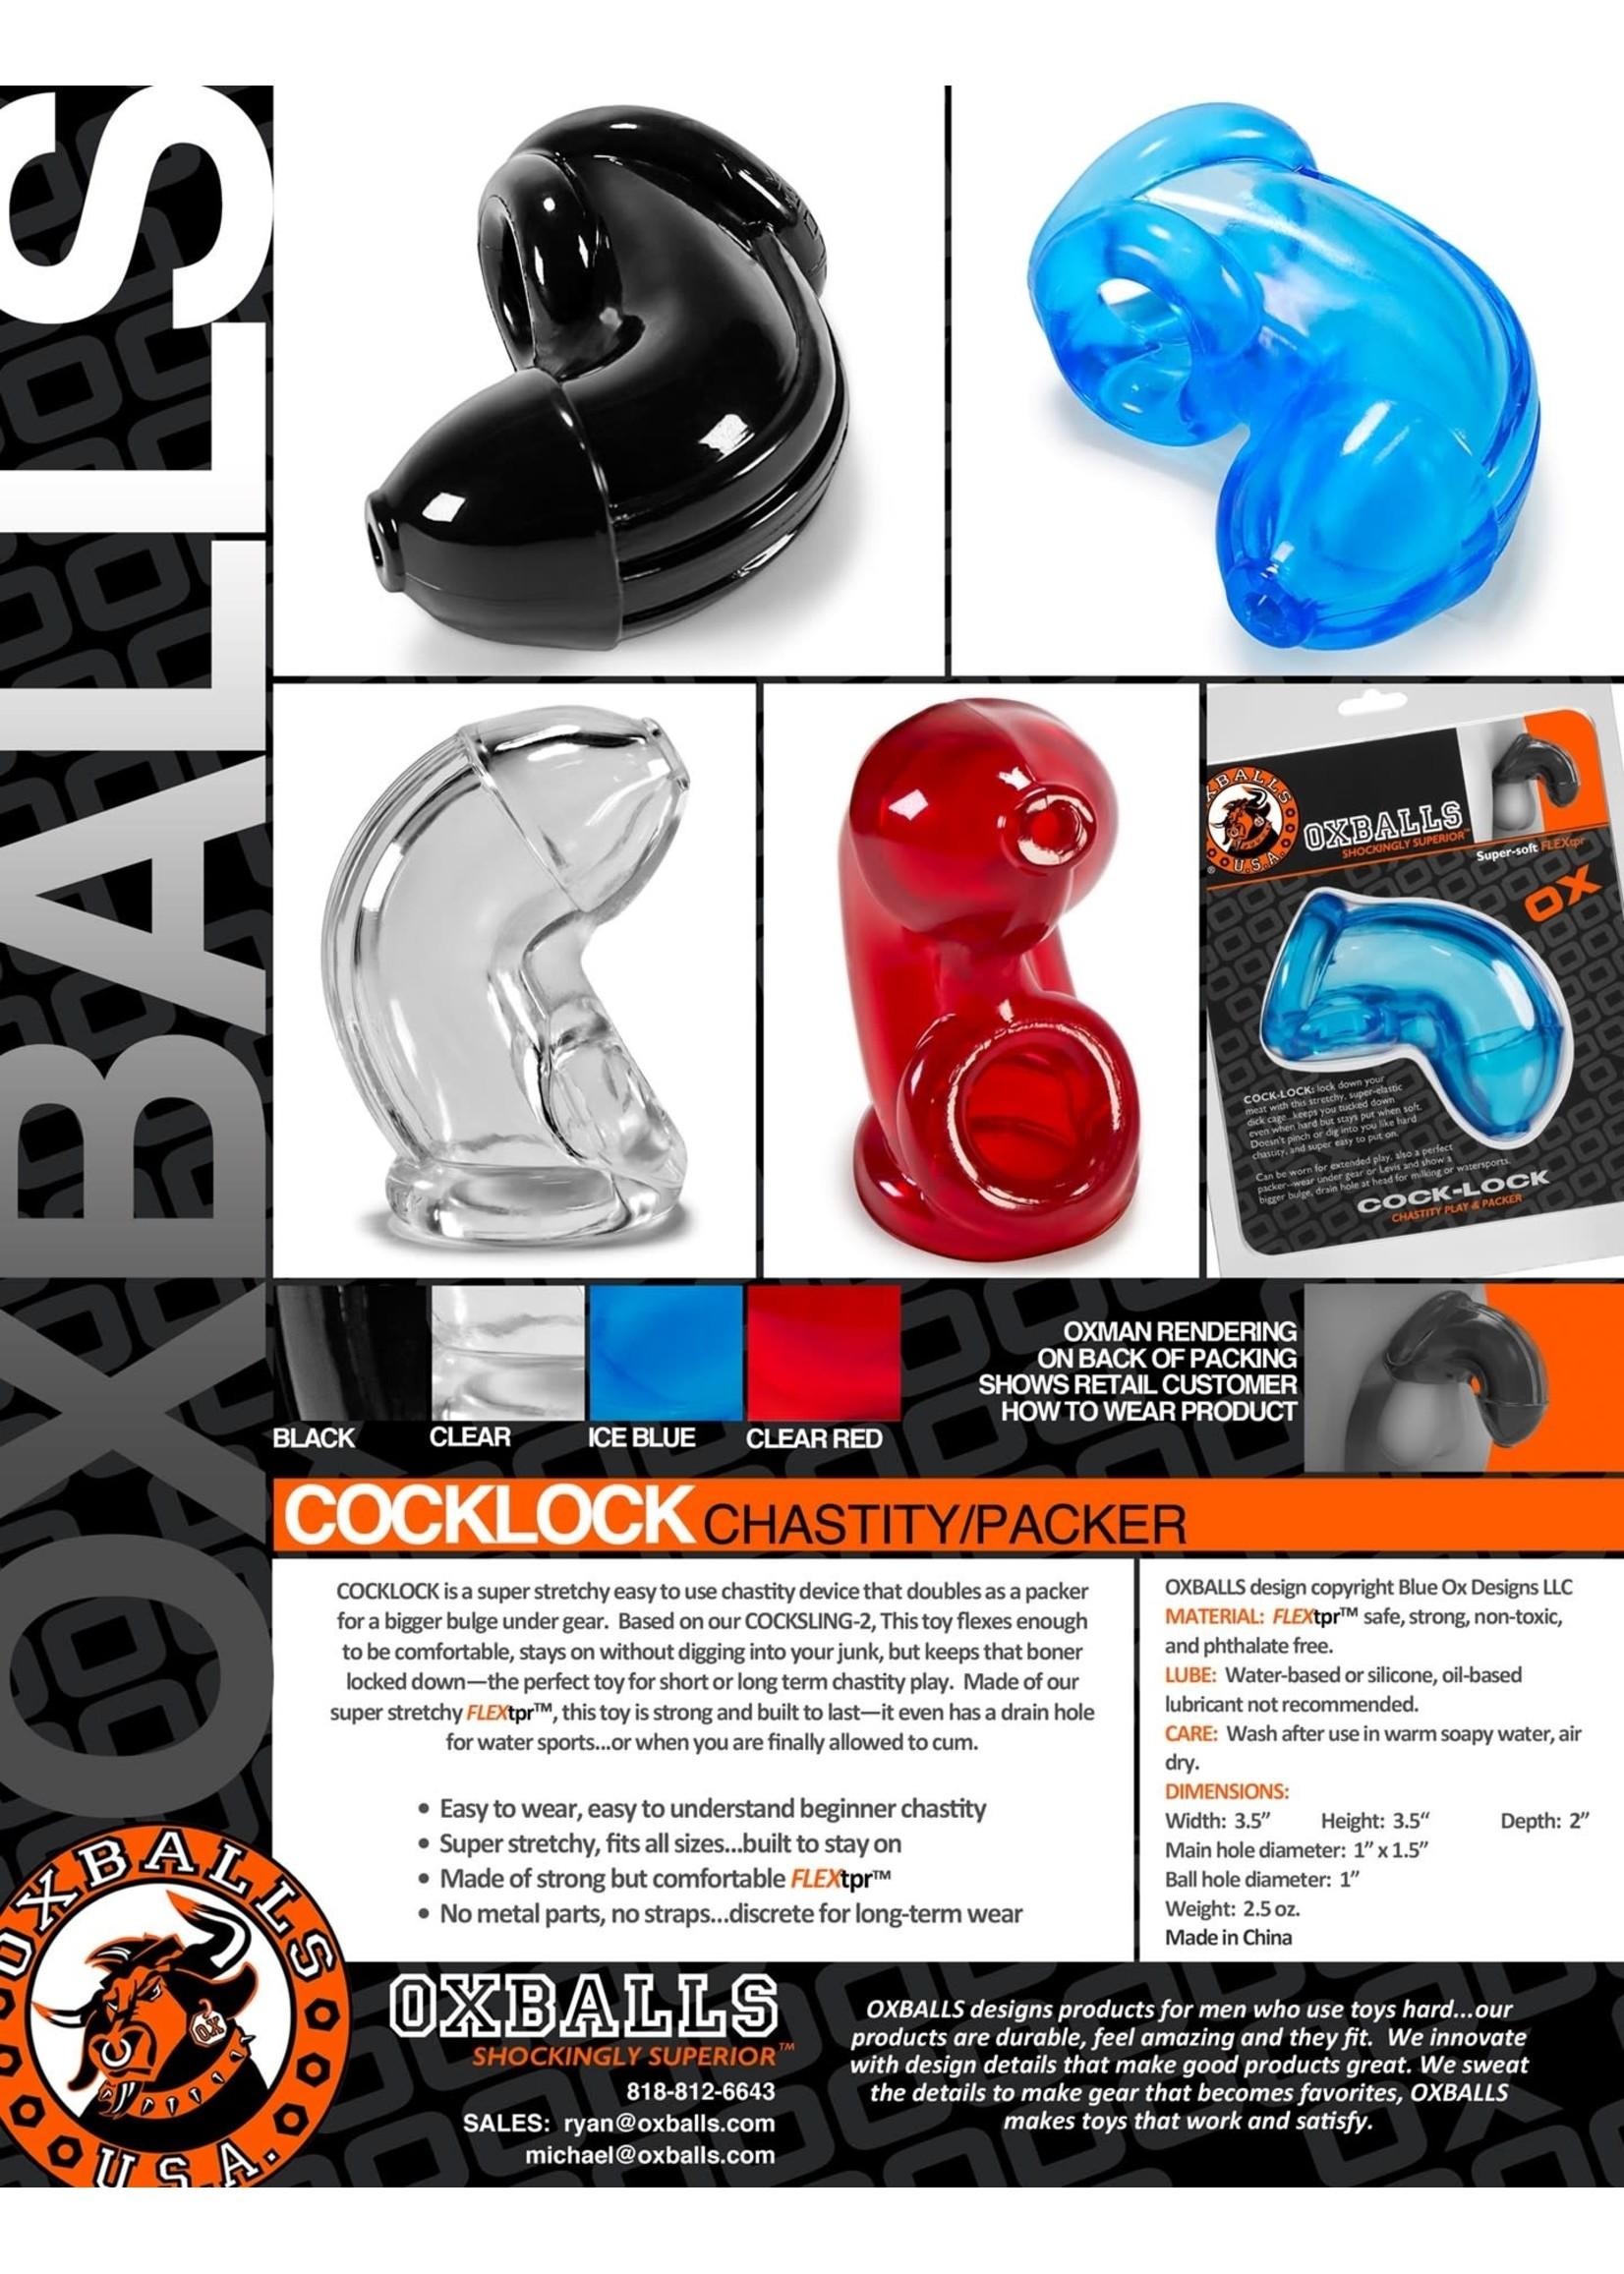 Oxballs Oxballs Cock-Lock